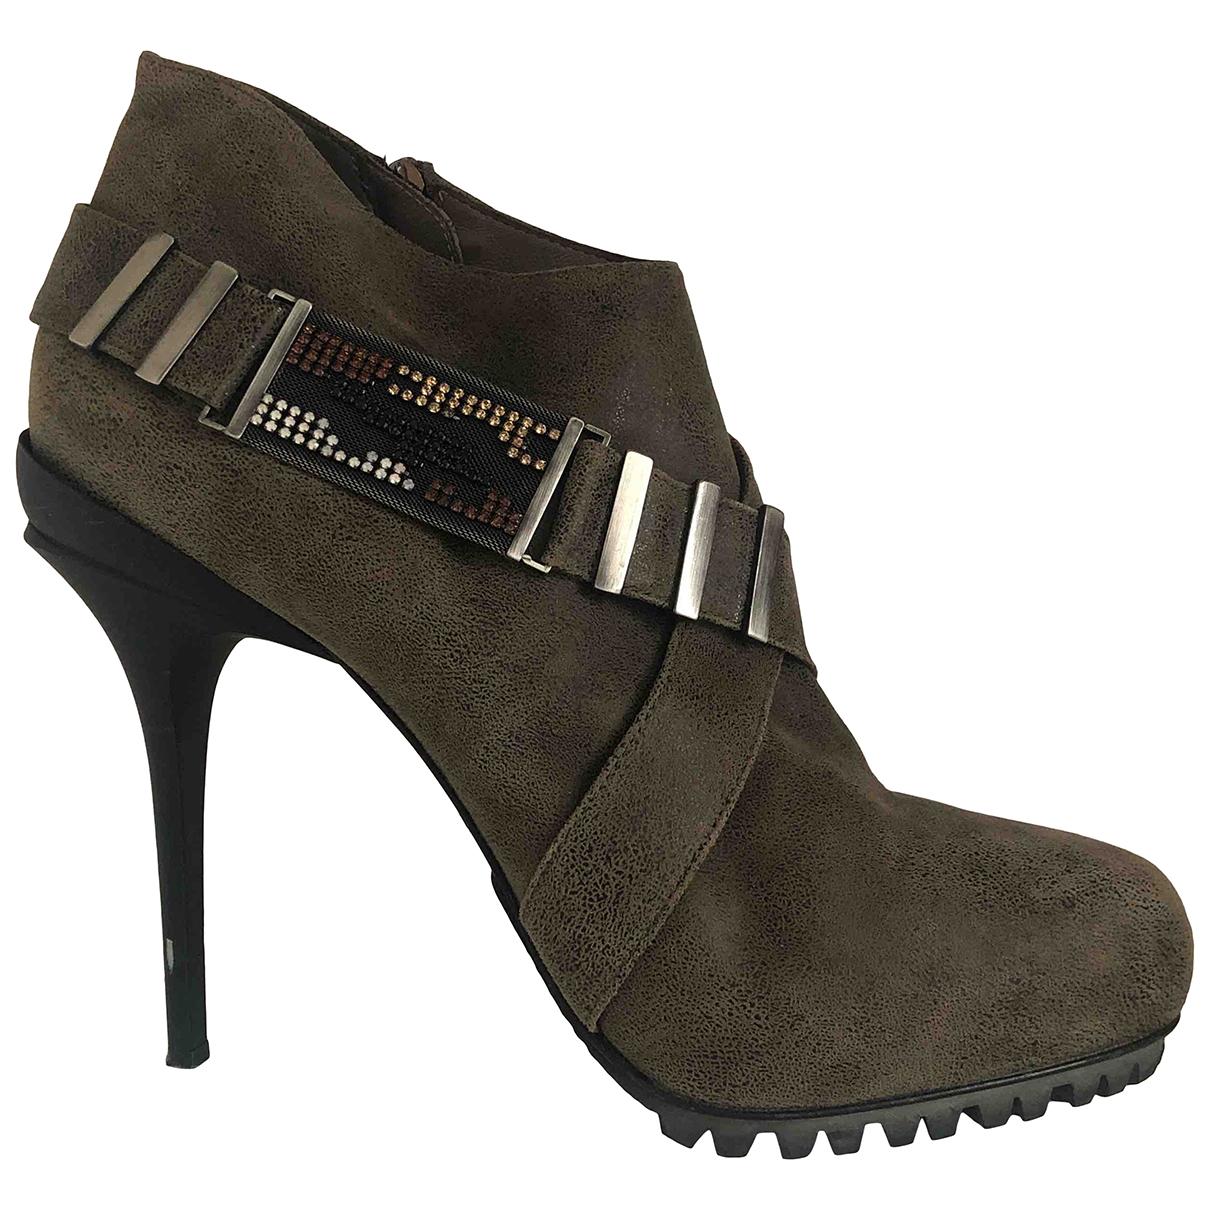 Le Silla \N Khaki Leather Heels for Women 40 EU